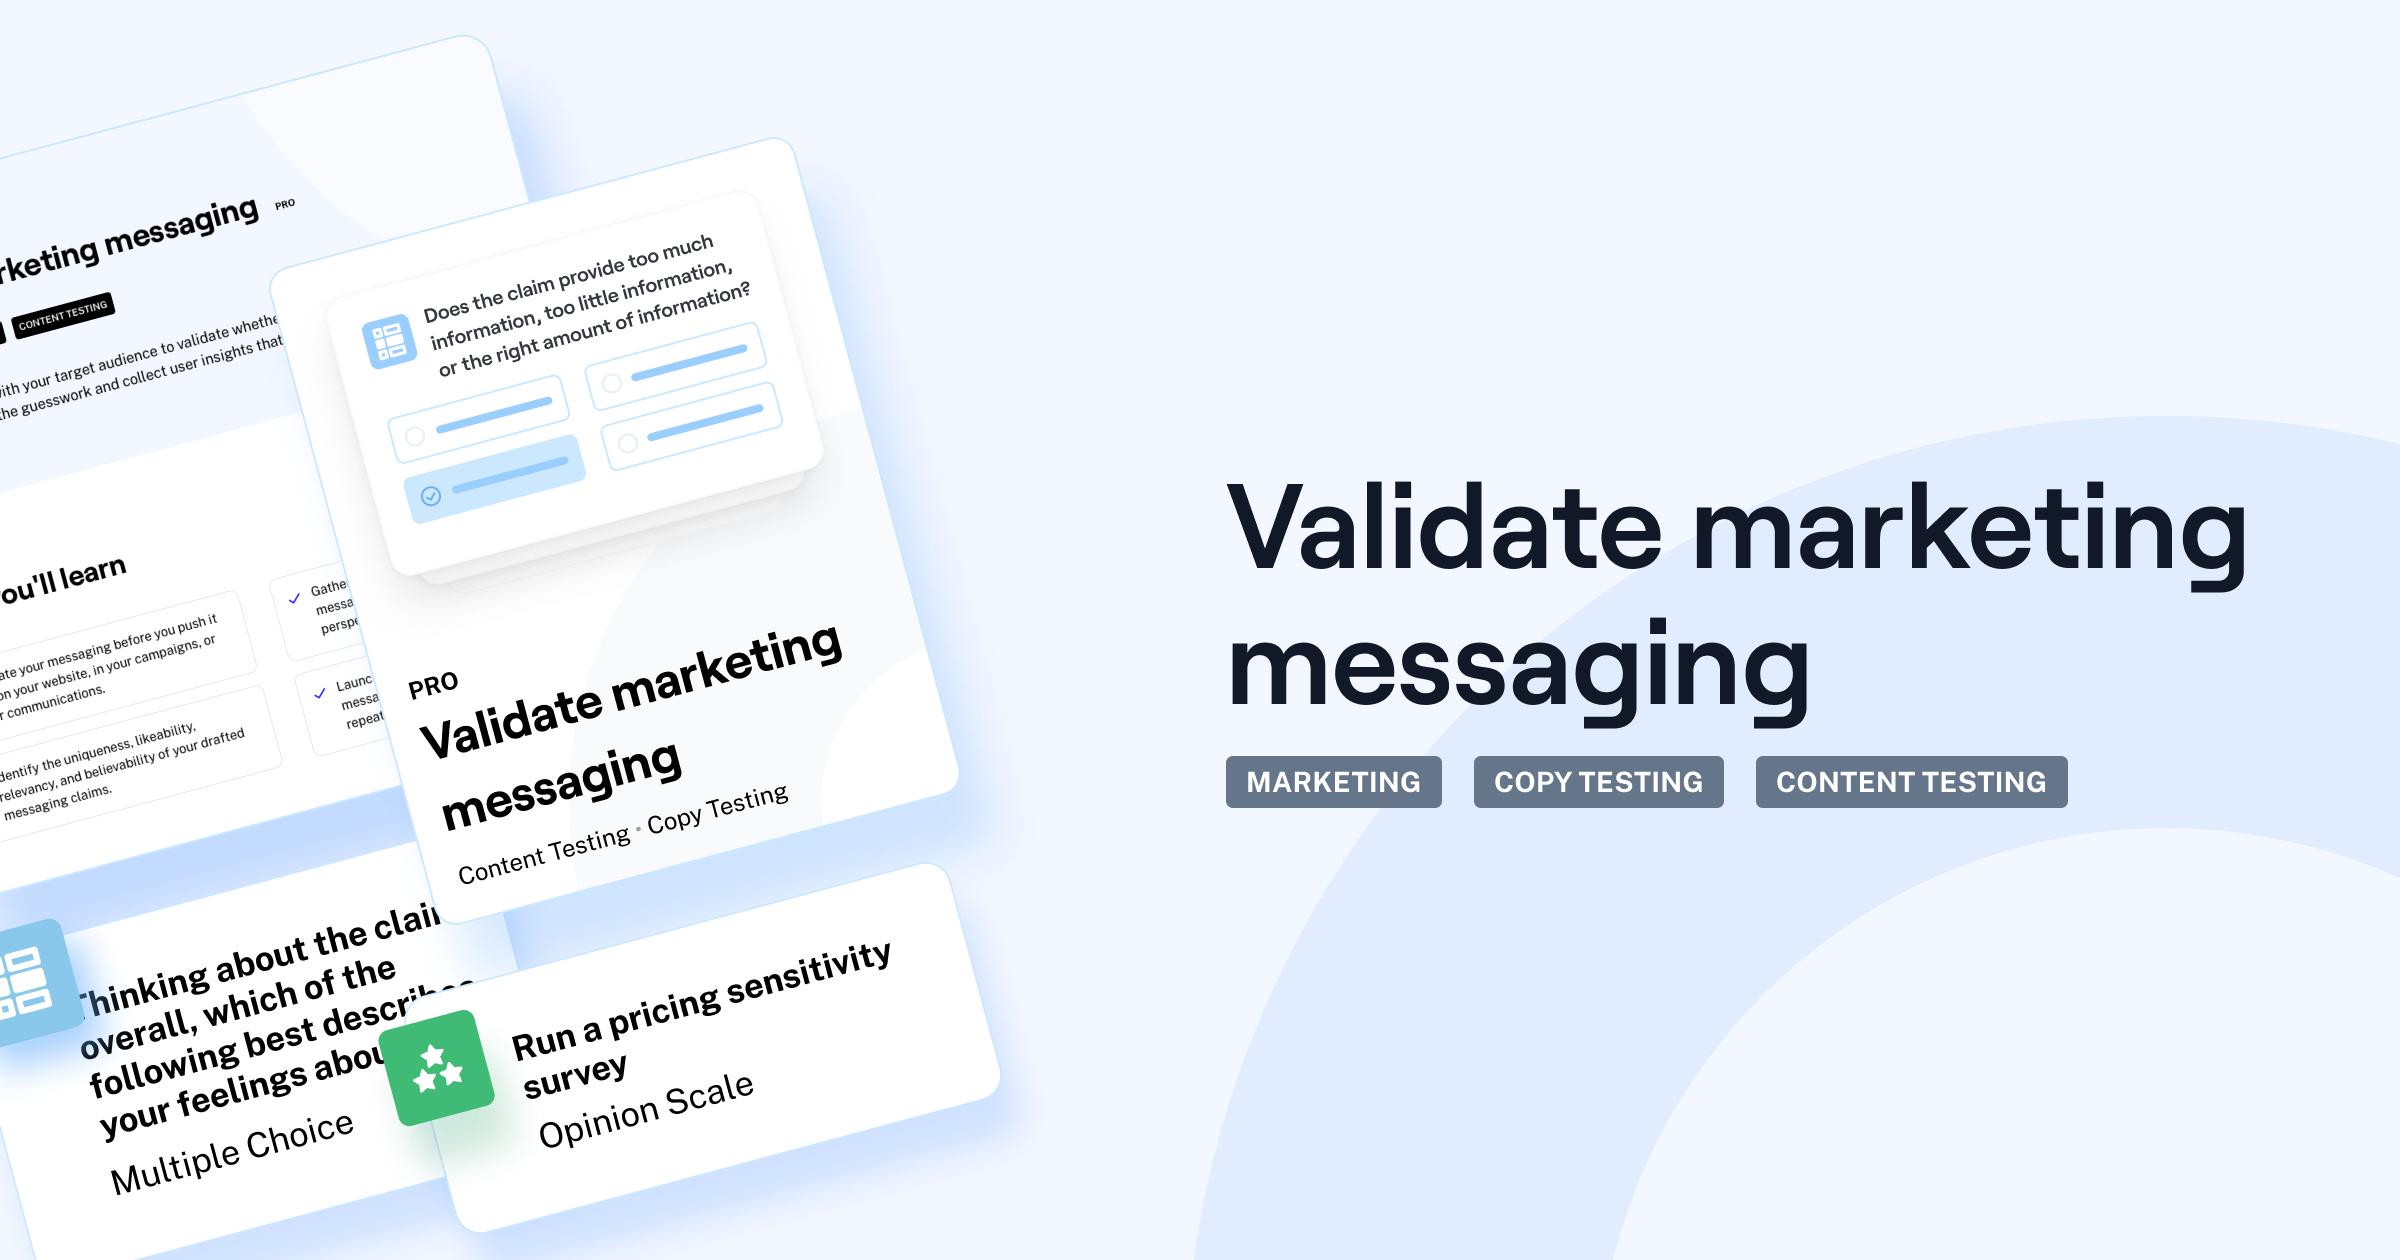 validate-marketing-messaging-template